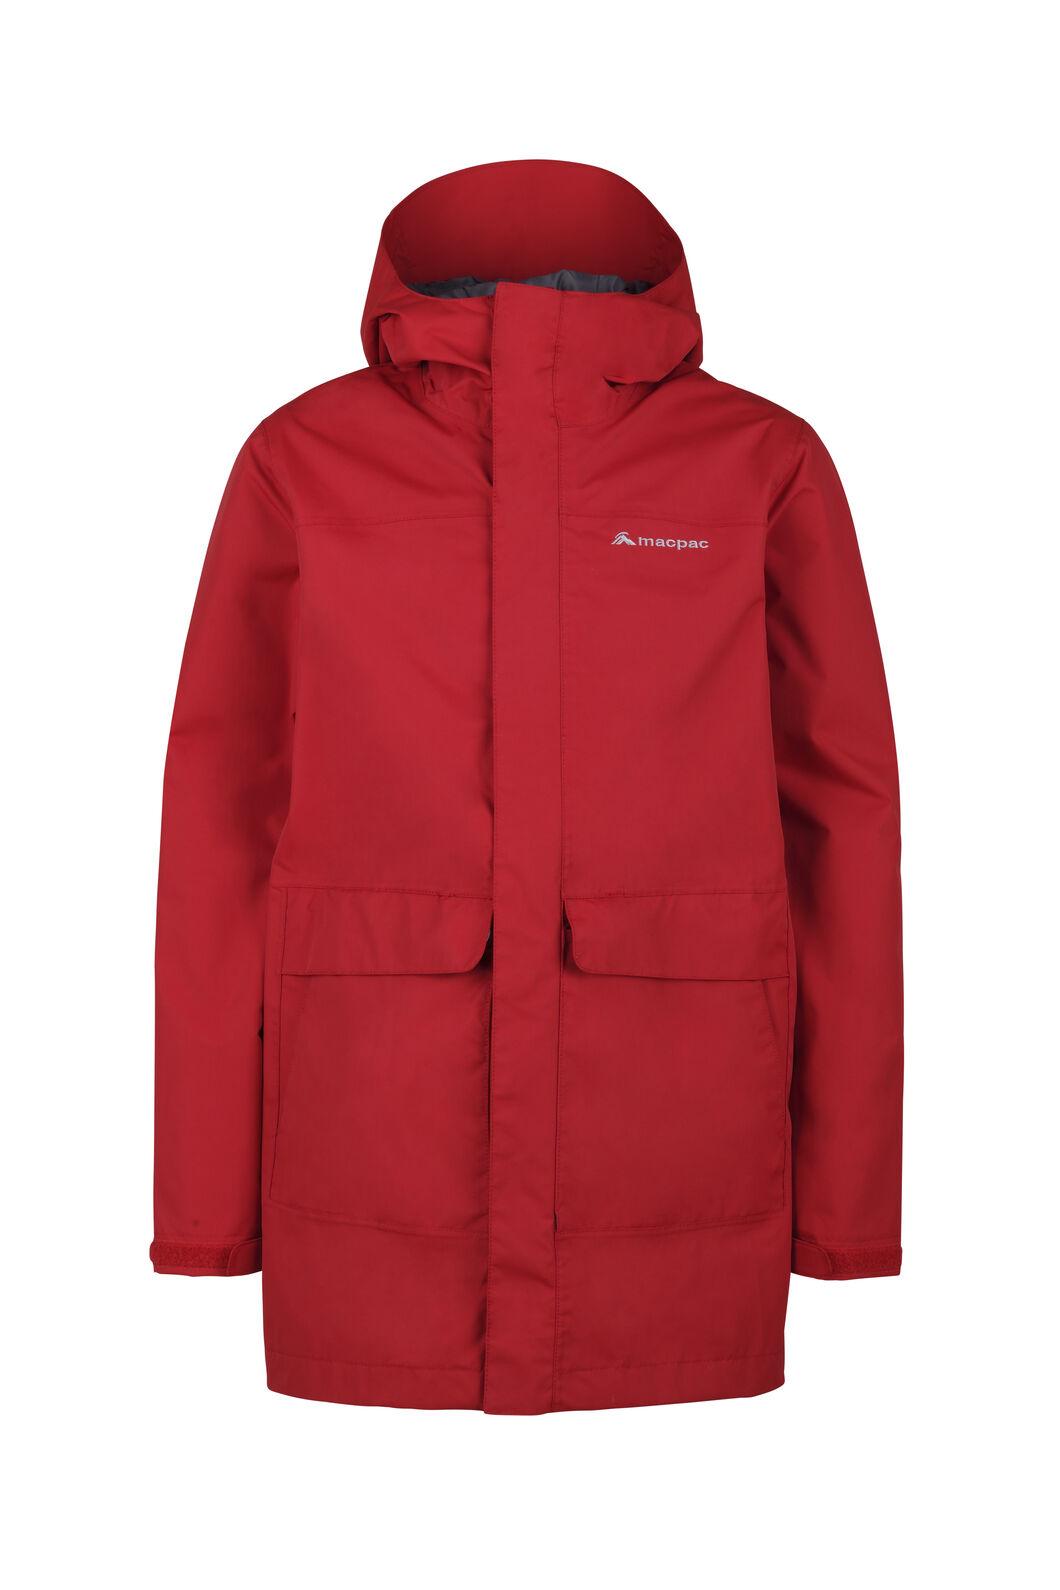 Macpac Lagoon Long Rain Jacket - Kids', Haute Red, hi-res